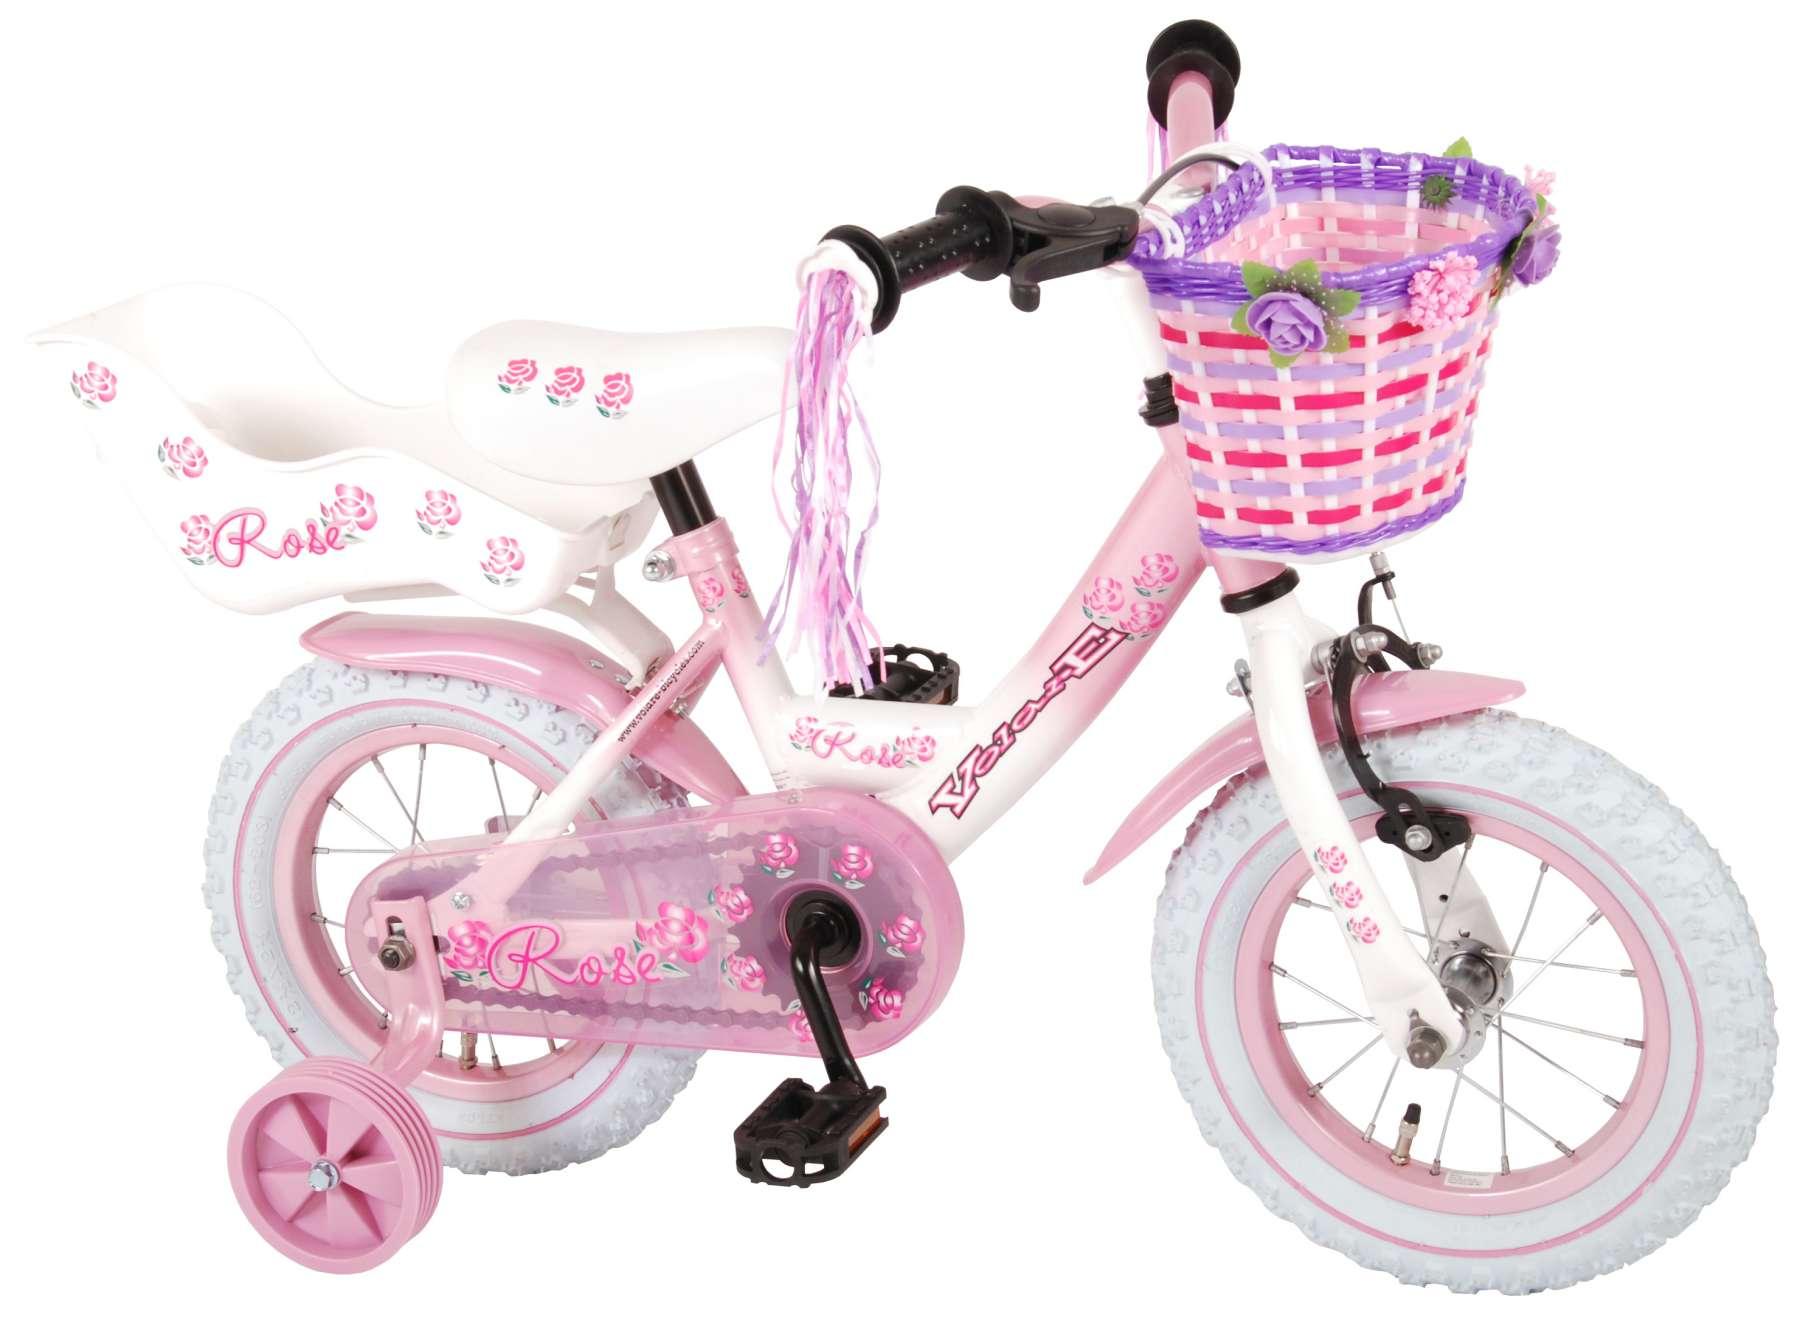 Volare Rose 12 Zoll  Kinderfahrrad - Mädchen - pink